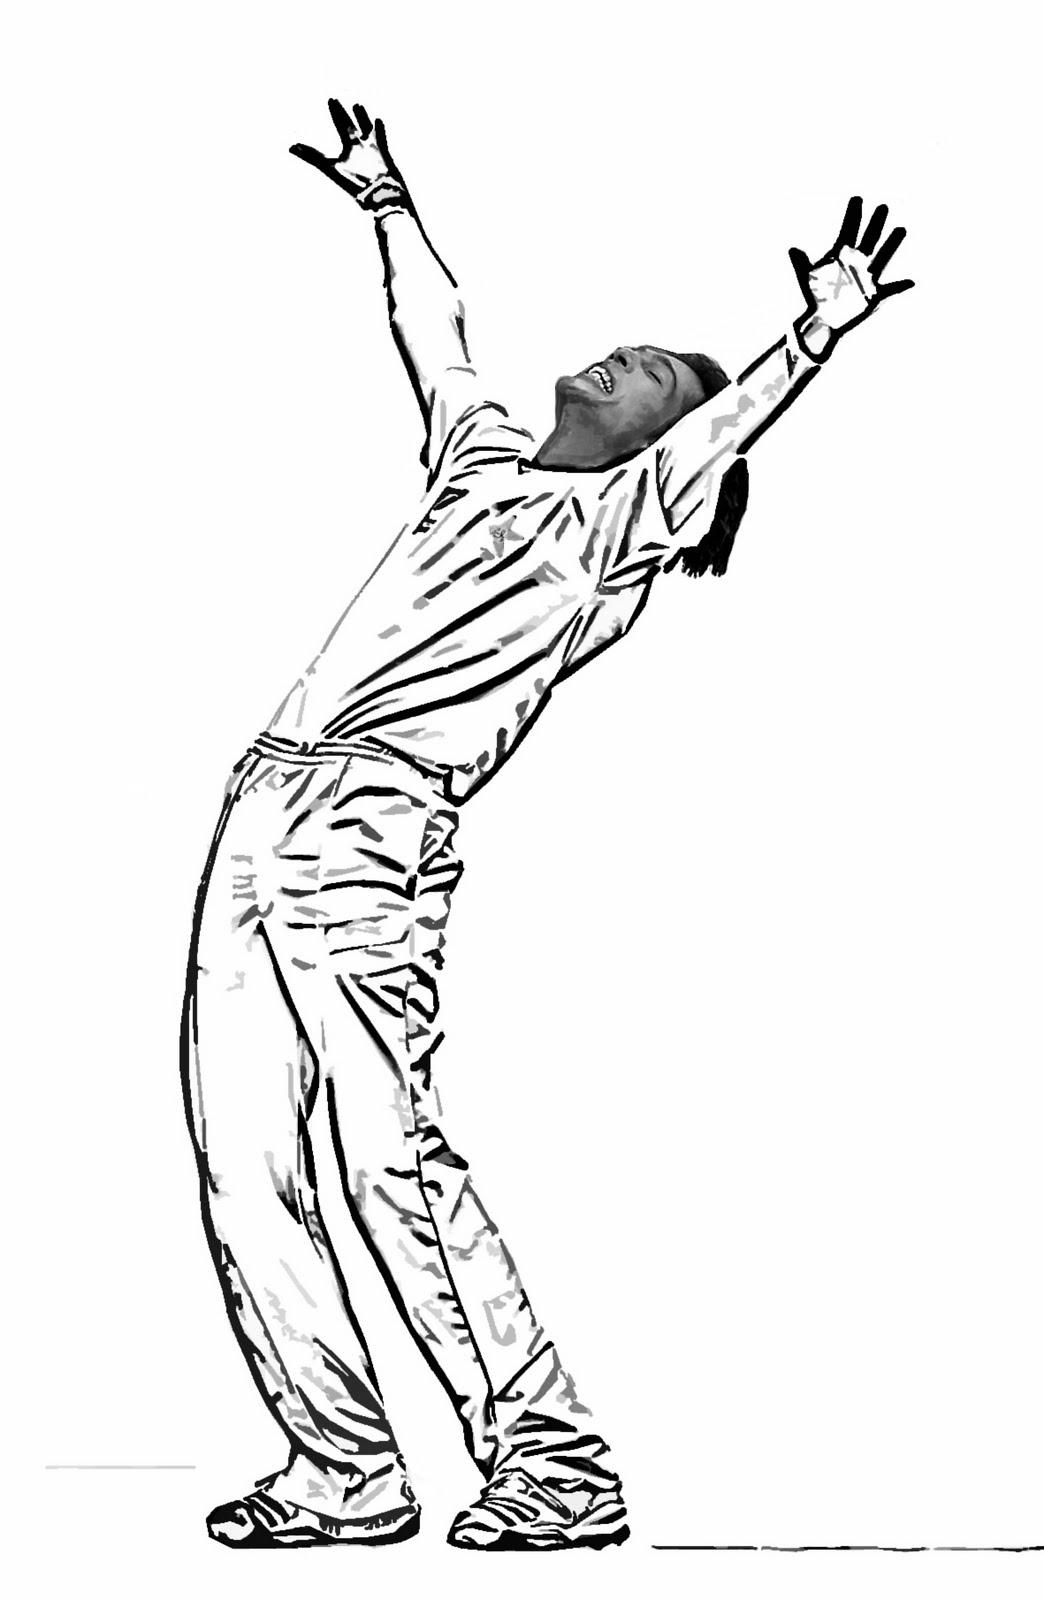 Cricket = Action = Art: How Sweet It Is!